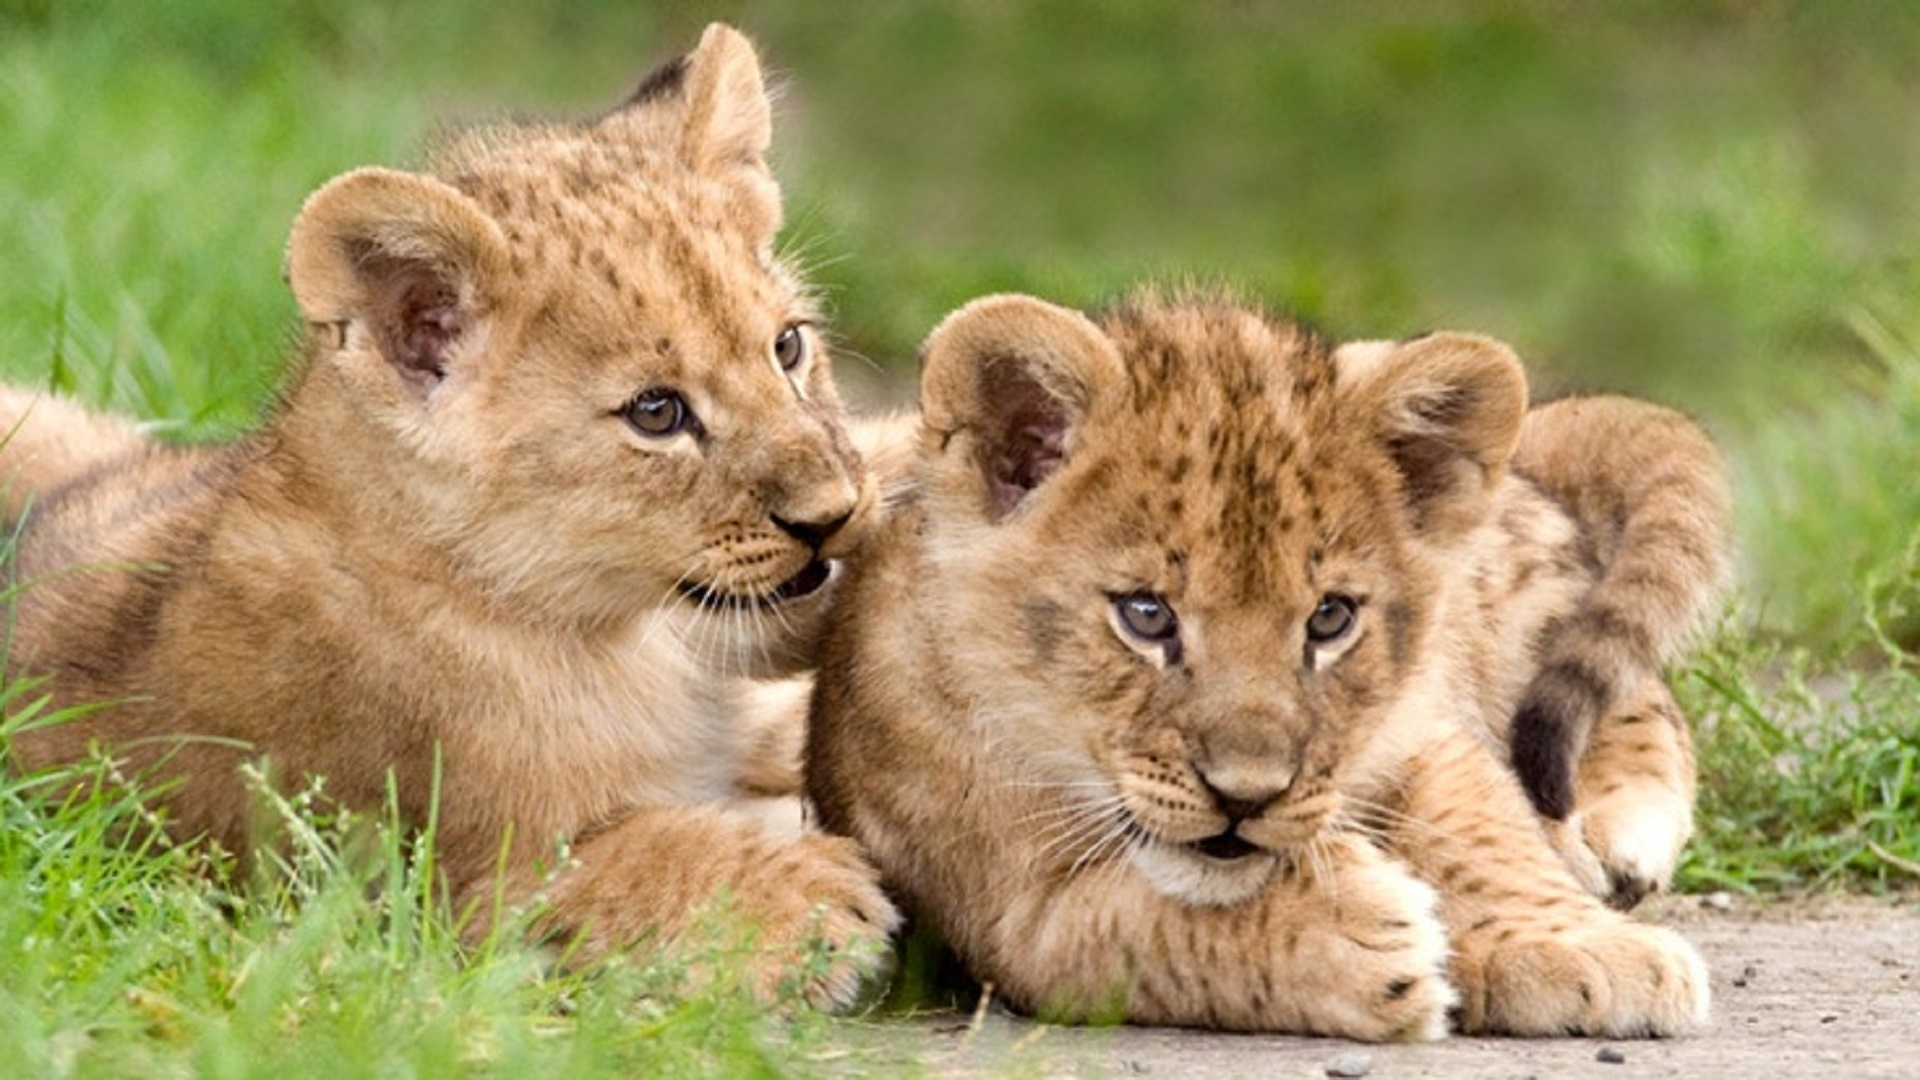 8k Animal Wallpaper Download: Lion Cub Wallpaper